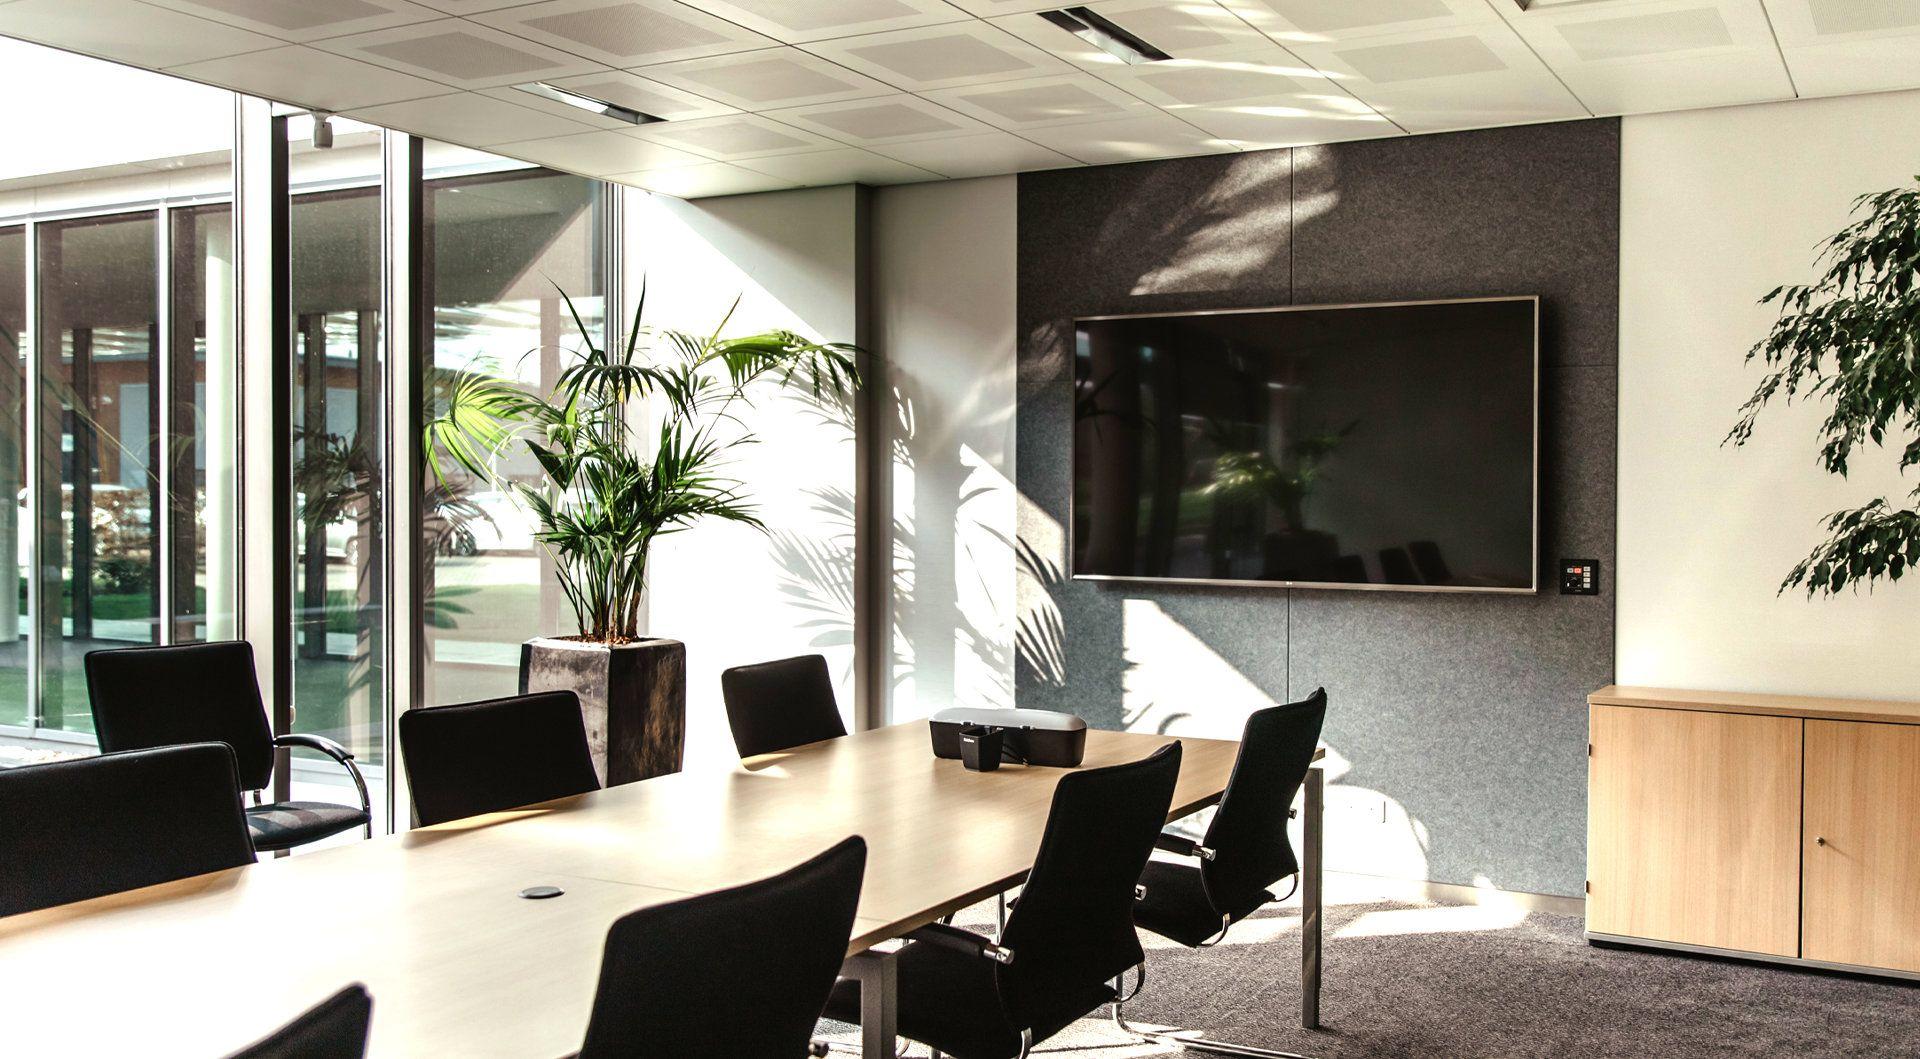 "LG 49XS4F beeldkrant 124,5 cm (49"") LED Full HD Digitale signage flatscreen Zwart - Case studie de vries"